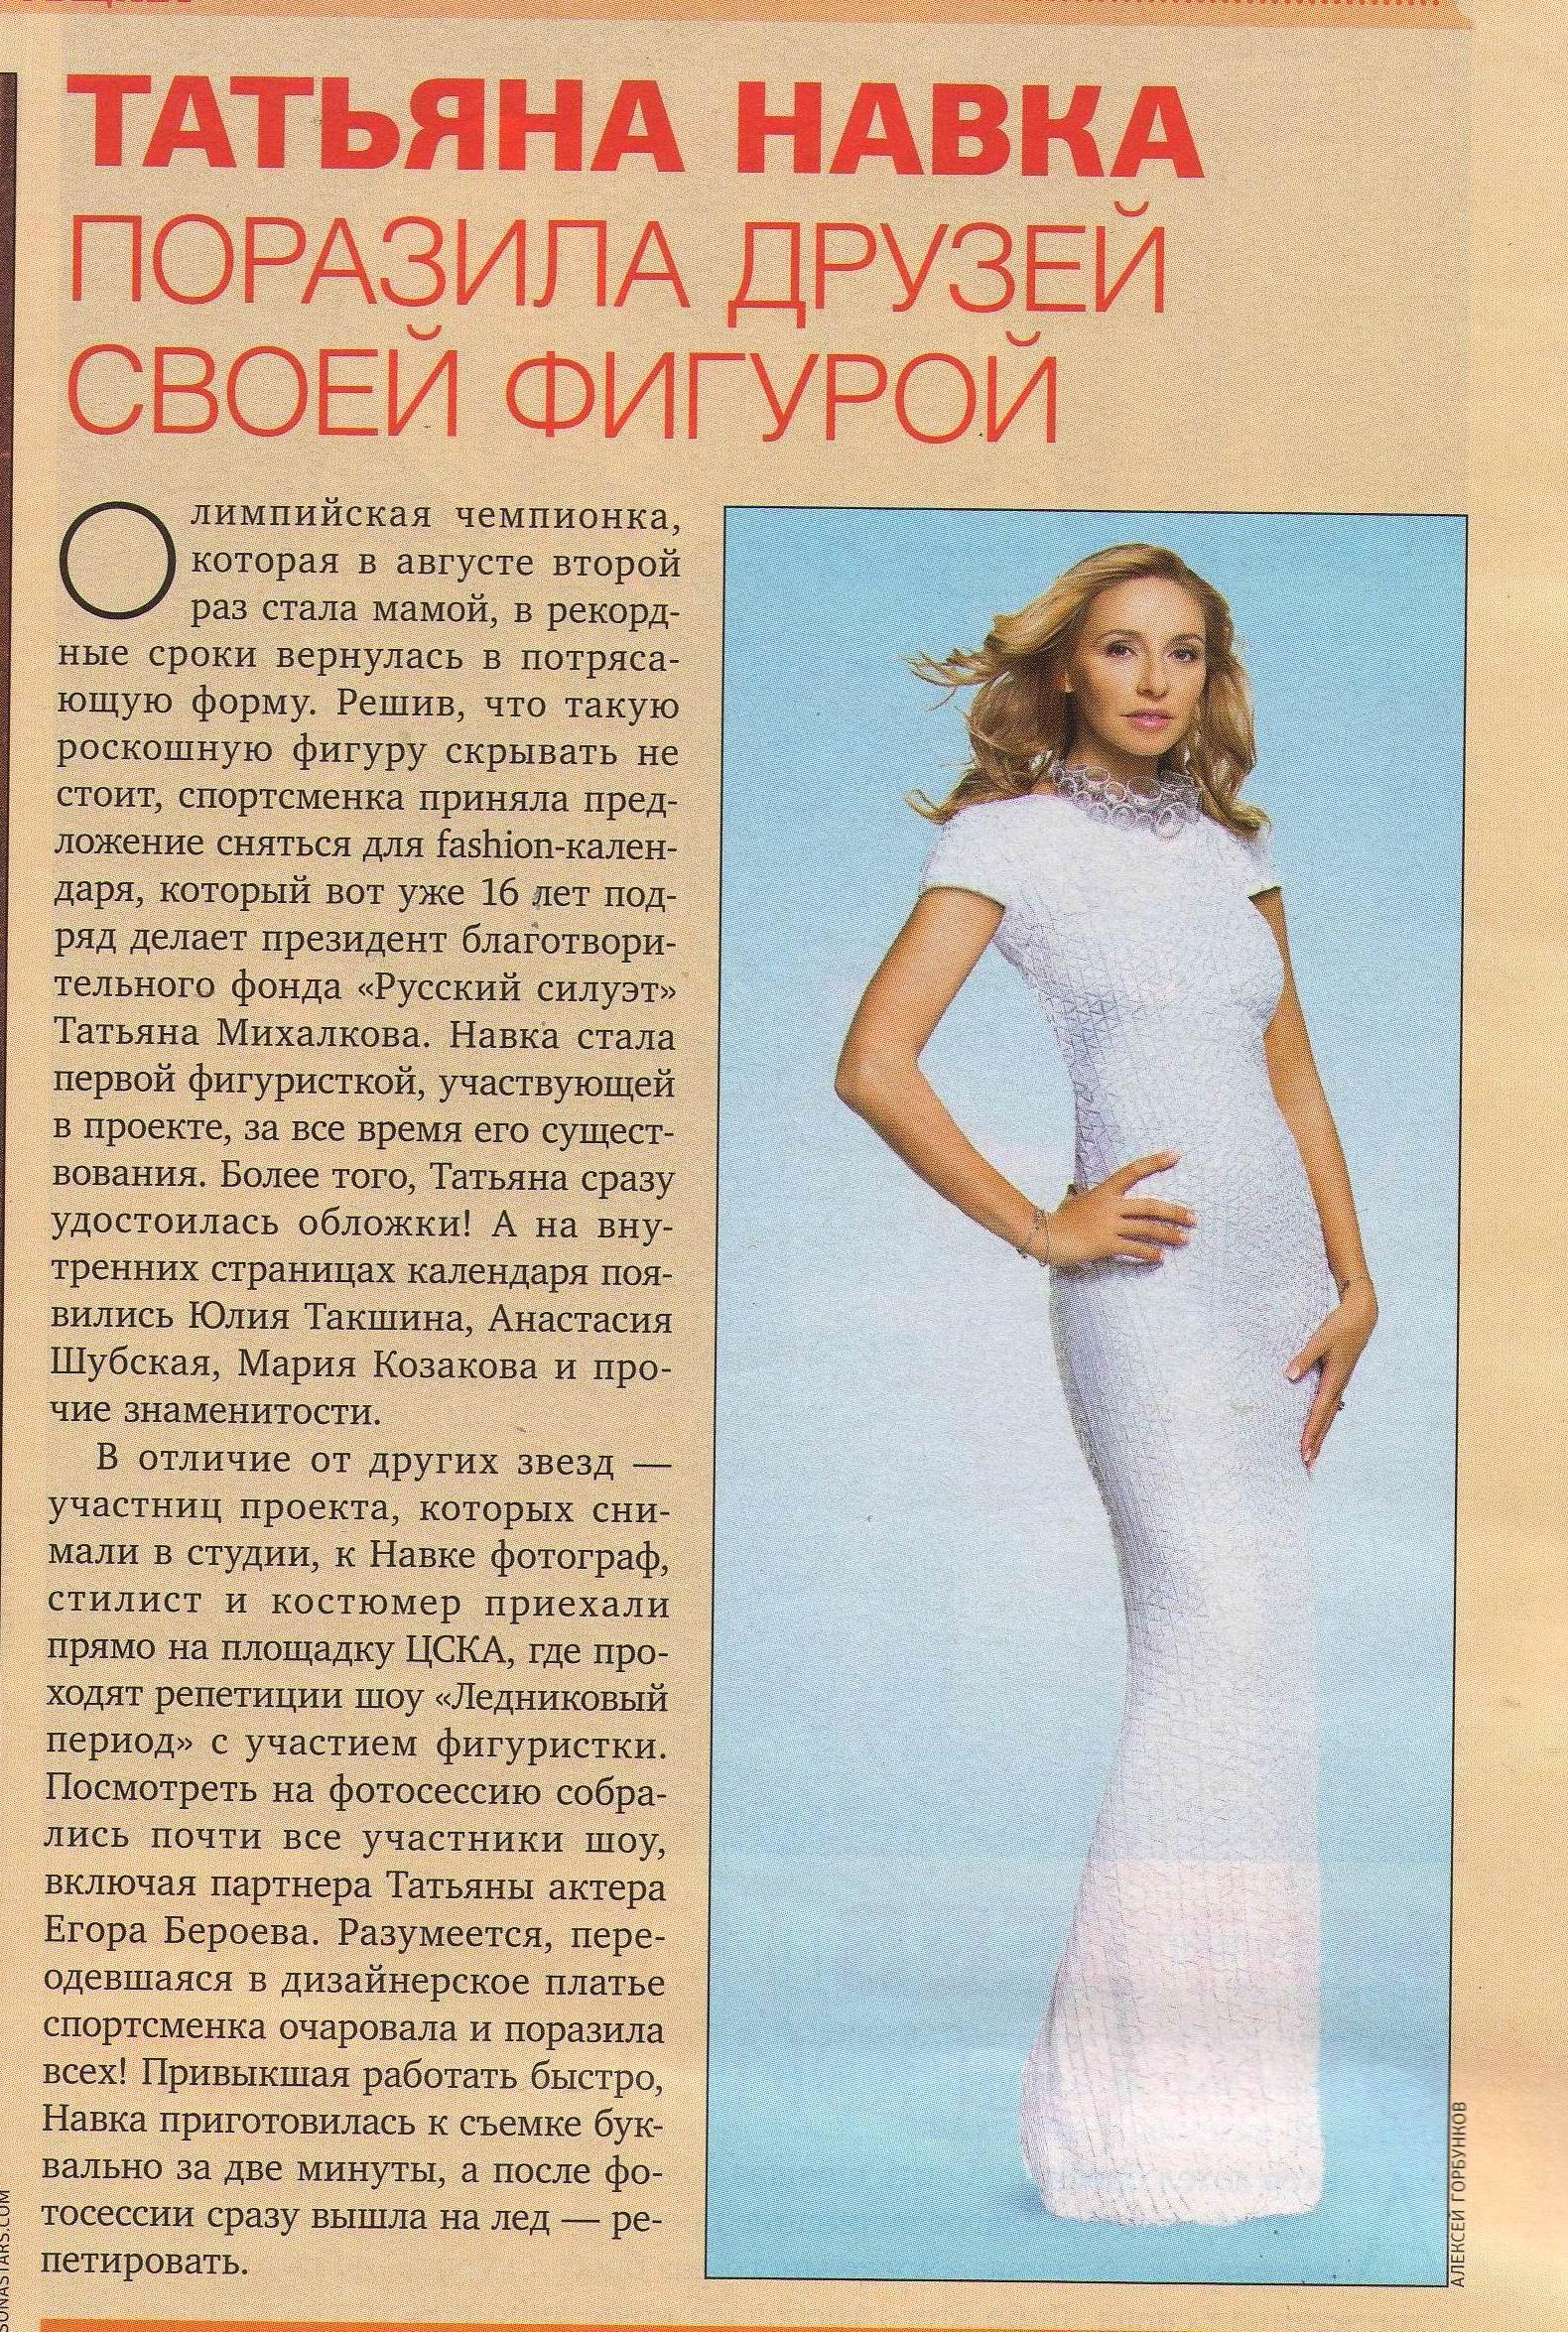 Татьяна Навка. Пресса FMqaH